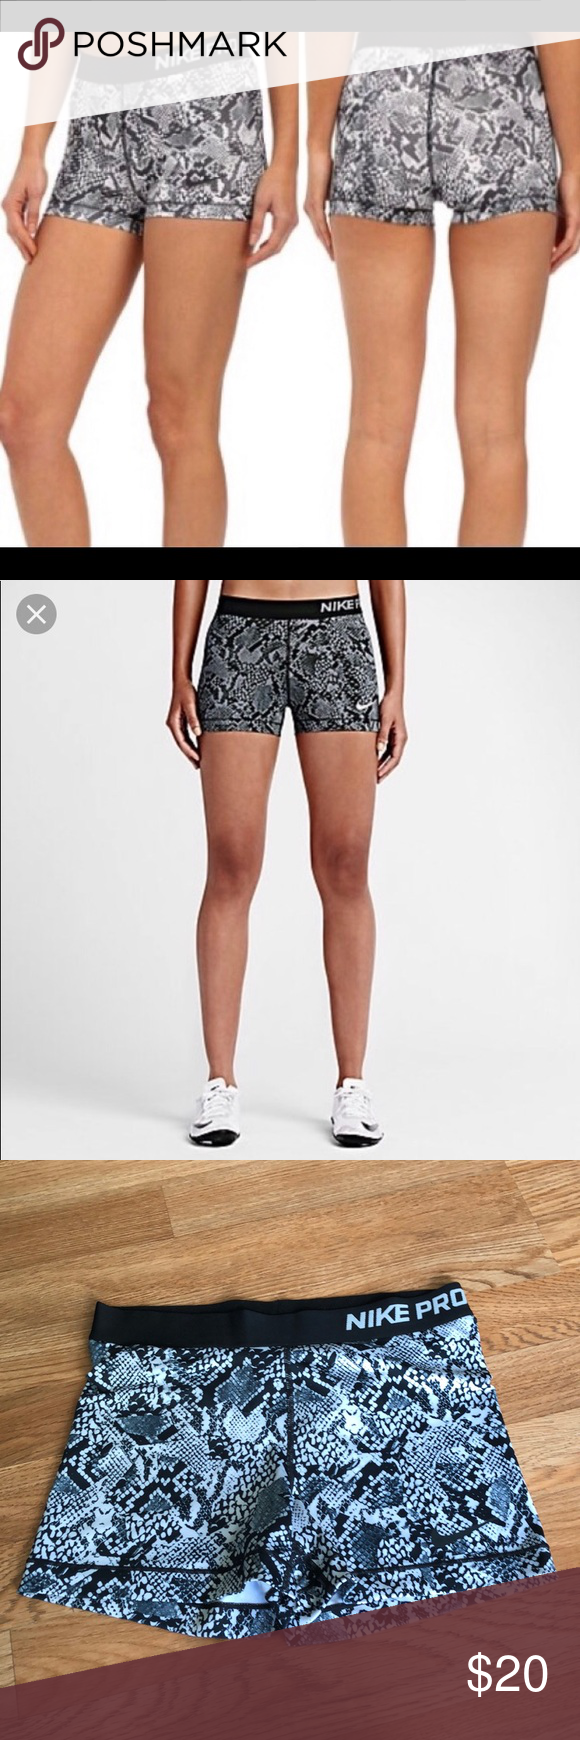 4106883b84 Snakeskin Nike Pro Spandex Shorts Nike Pro Snakeskin Spandex shorts •  Comfortable Nike Pro design •